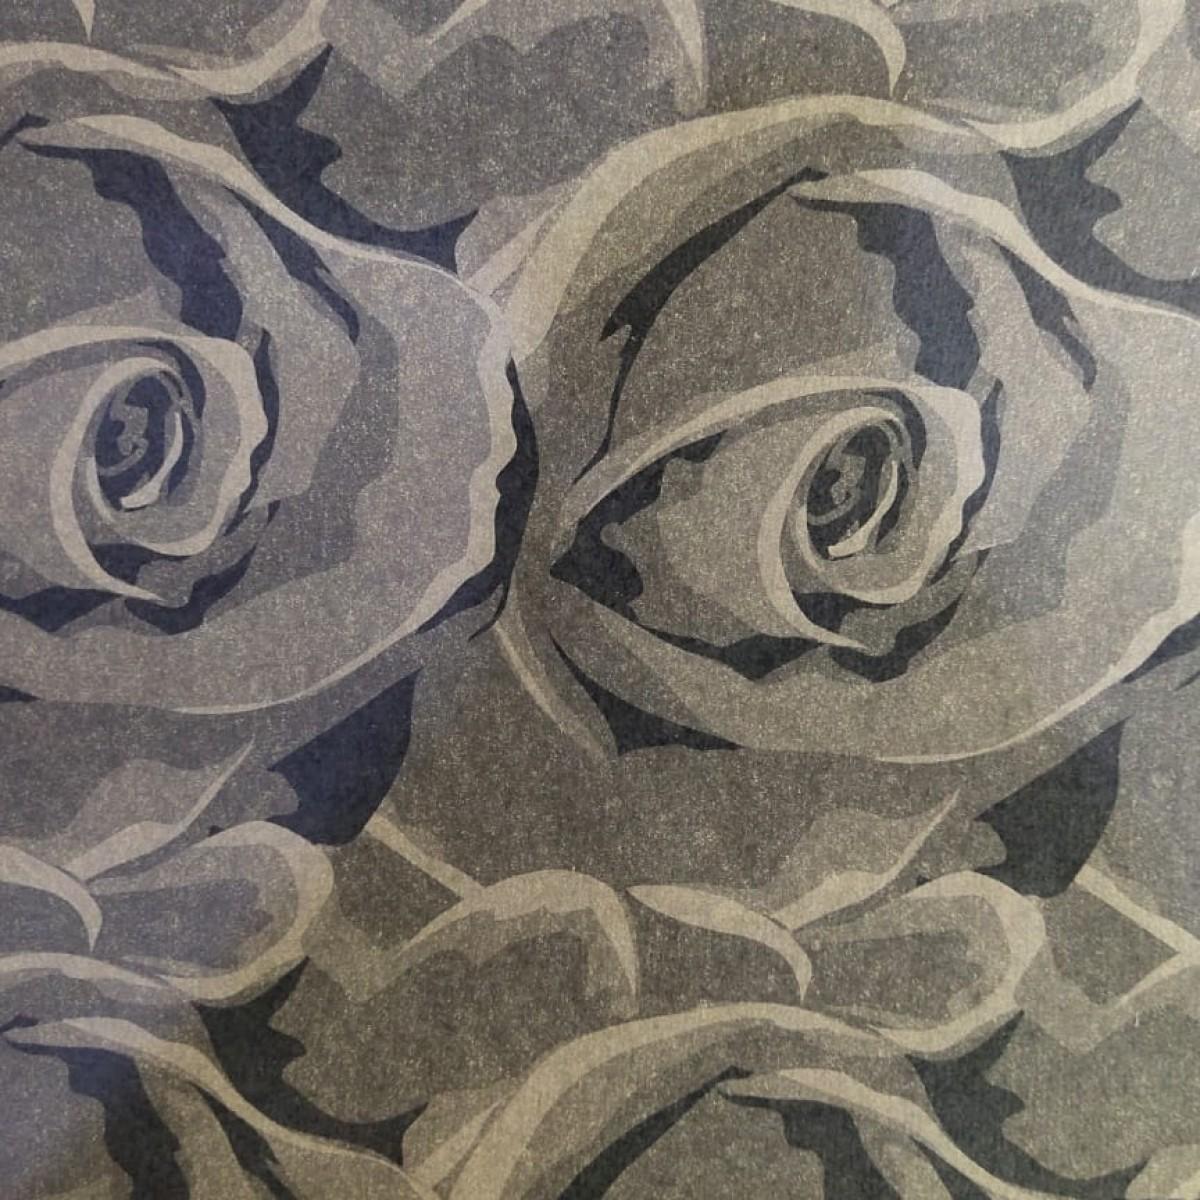 Black Floral Print 50cmx25m Kraft Paper - 1 Roll